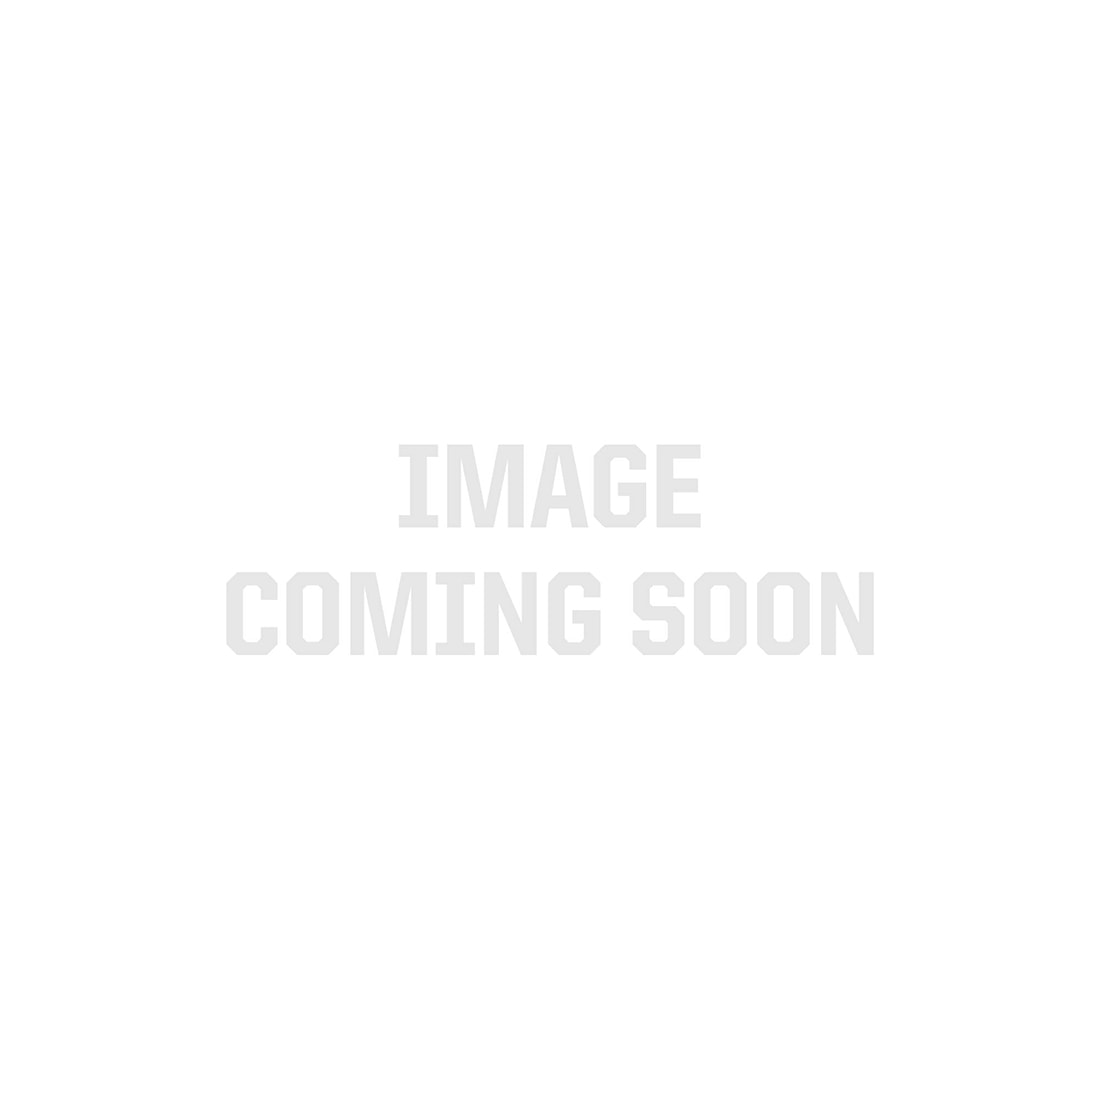 Blue 5050 Single Row CurrentControl LED Strip Light, 60/m, 12mm wide, Sample Kit